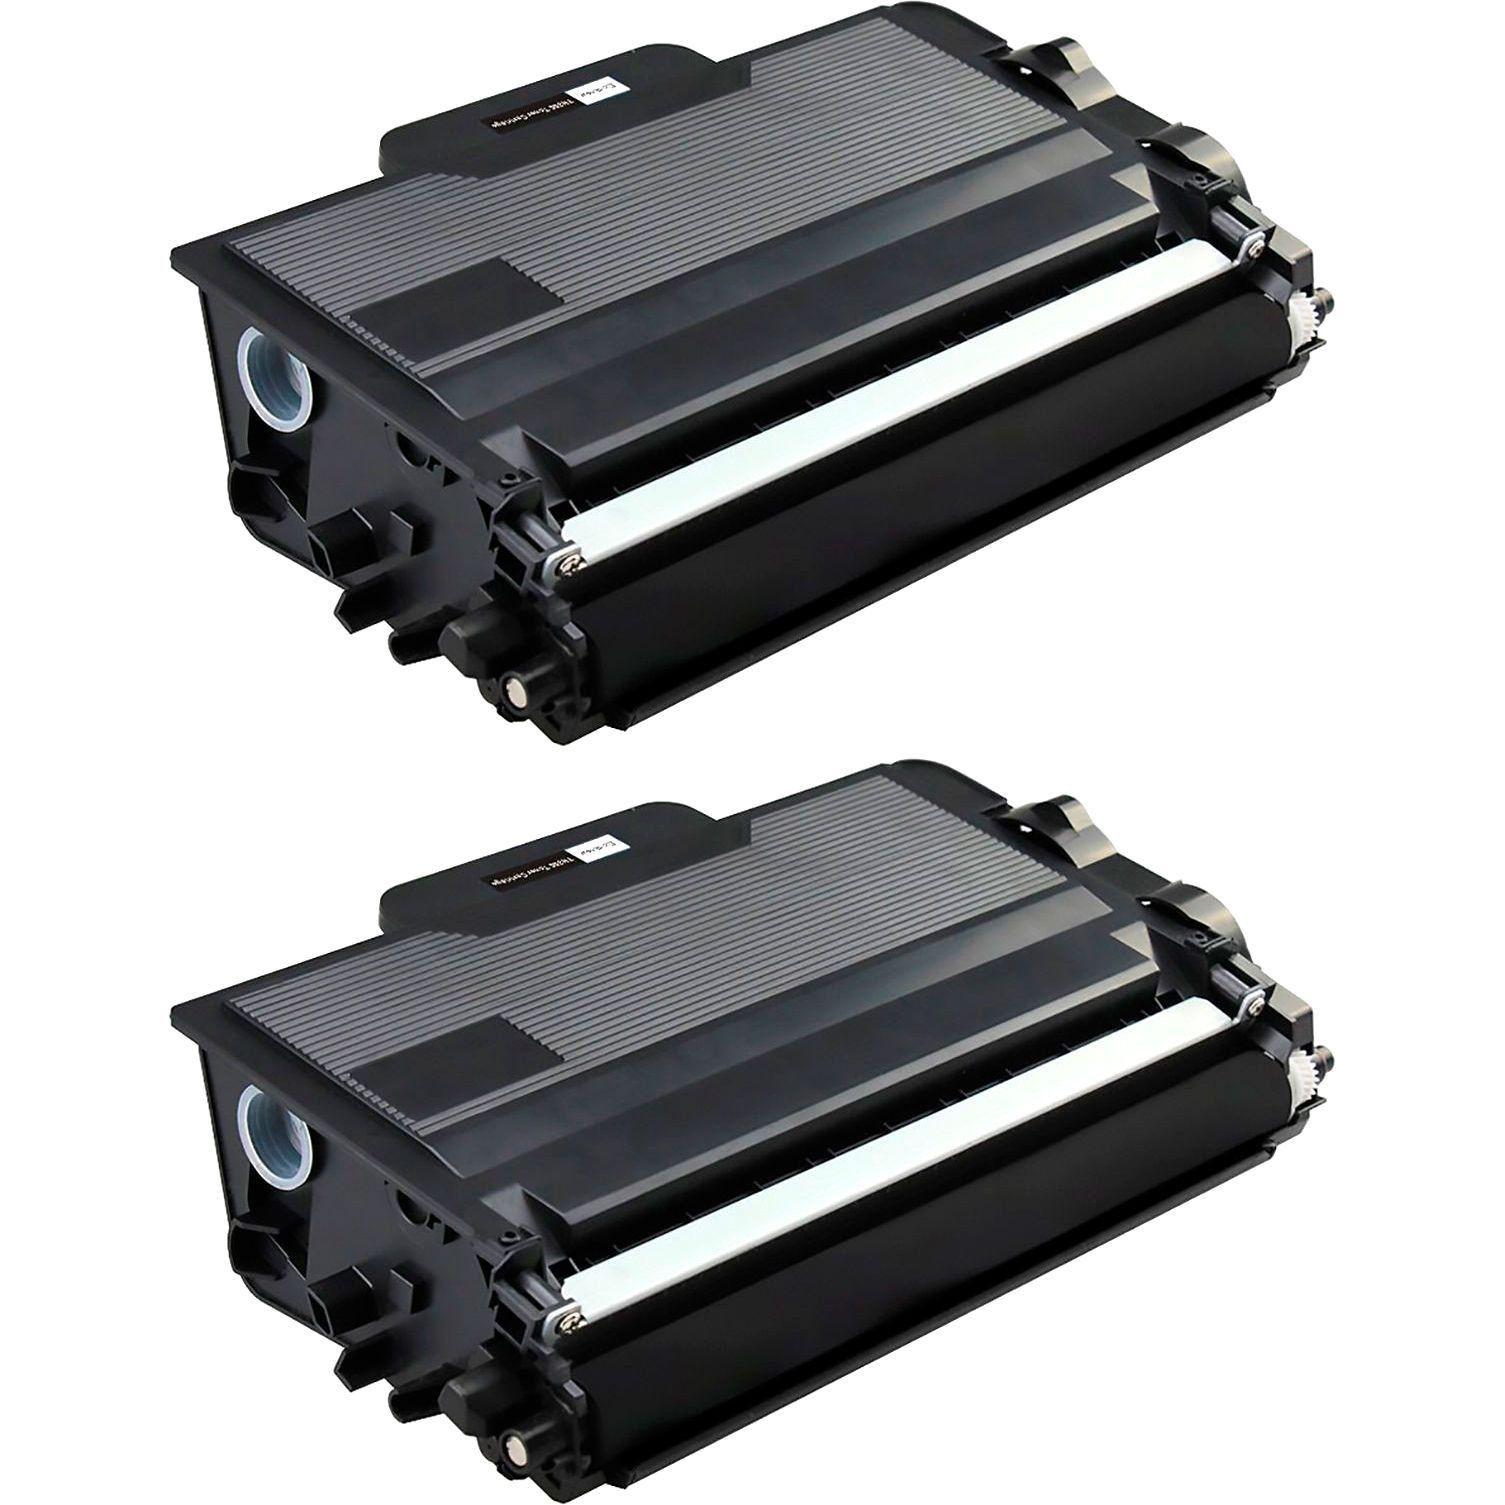 Compatível: Kit 2x Toner TN3442 TN850 para Brother HL-L5102dw L6202dw L6402dw MFC-L5702dw DCP-L5602 / Preto / 8.000